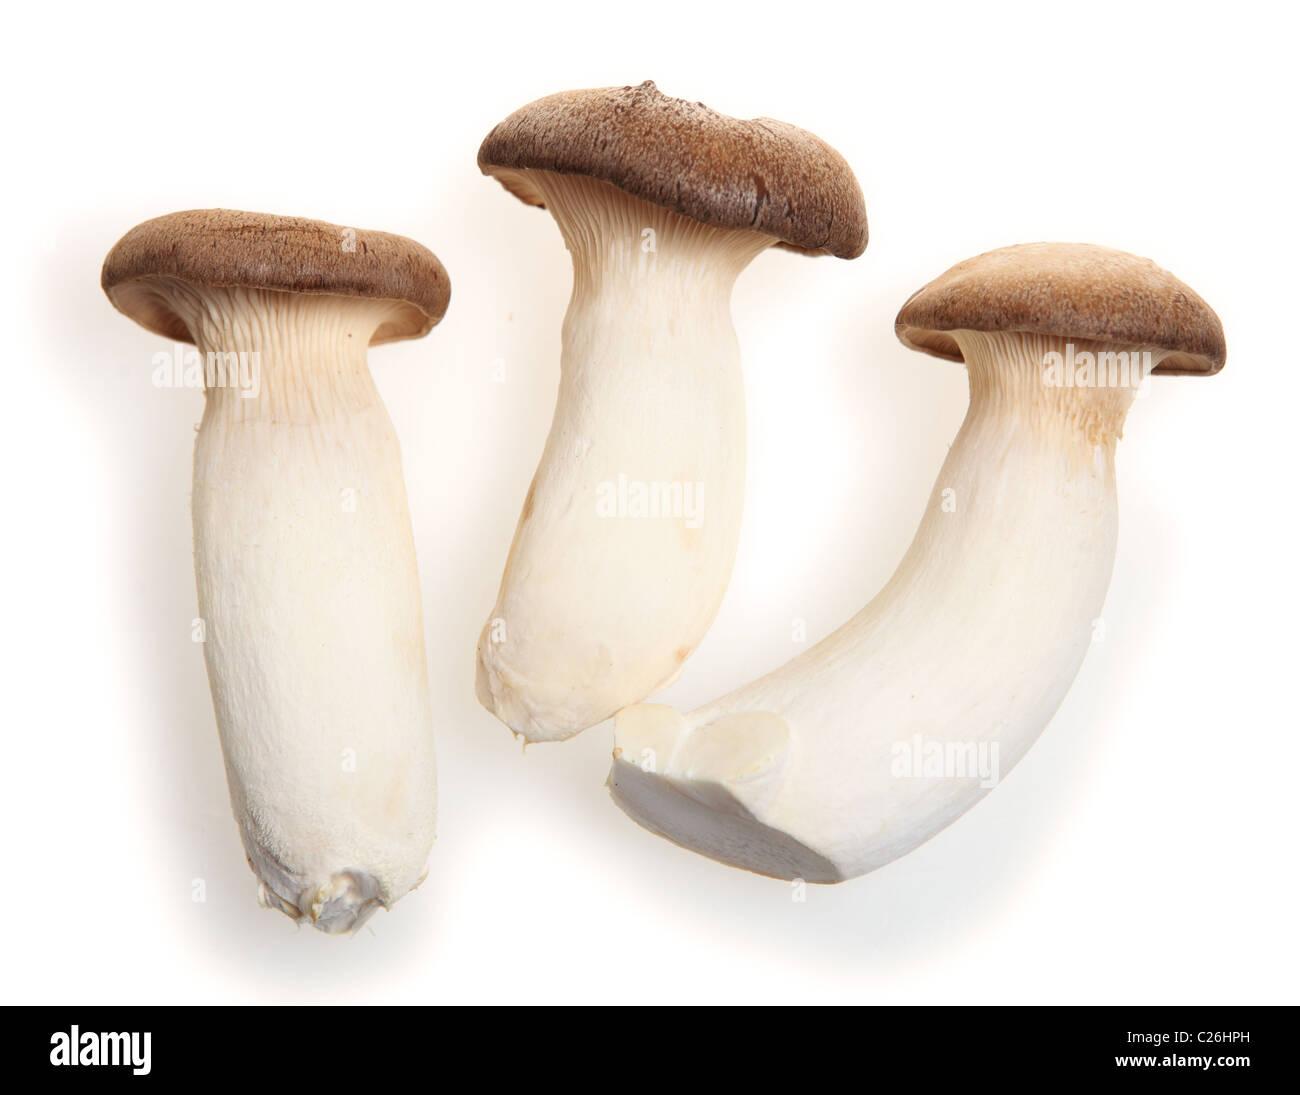 Pleurotus eryngii known as the king oyster mushroom. king trumpet mushroom or french horn mushroom. It is used in - Stock Image